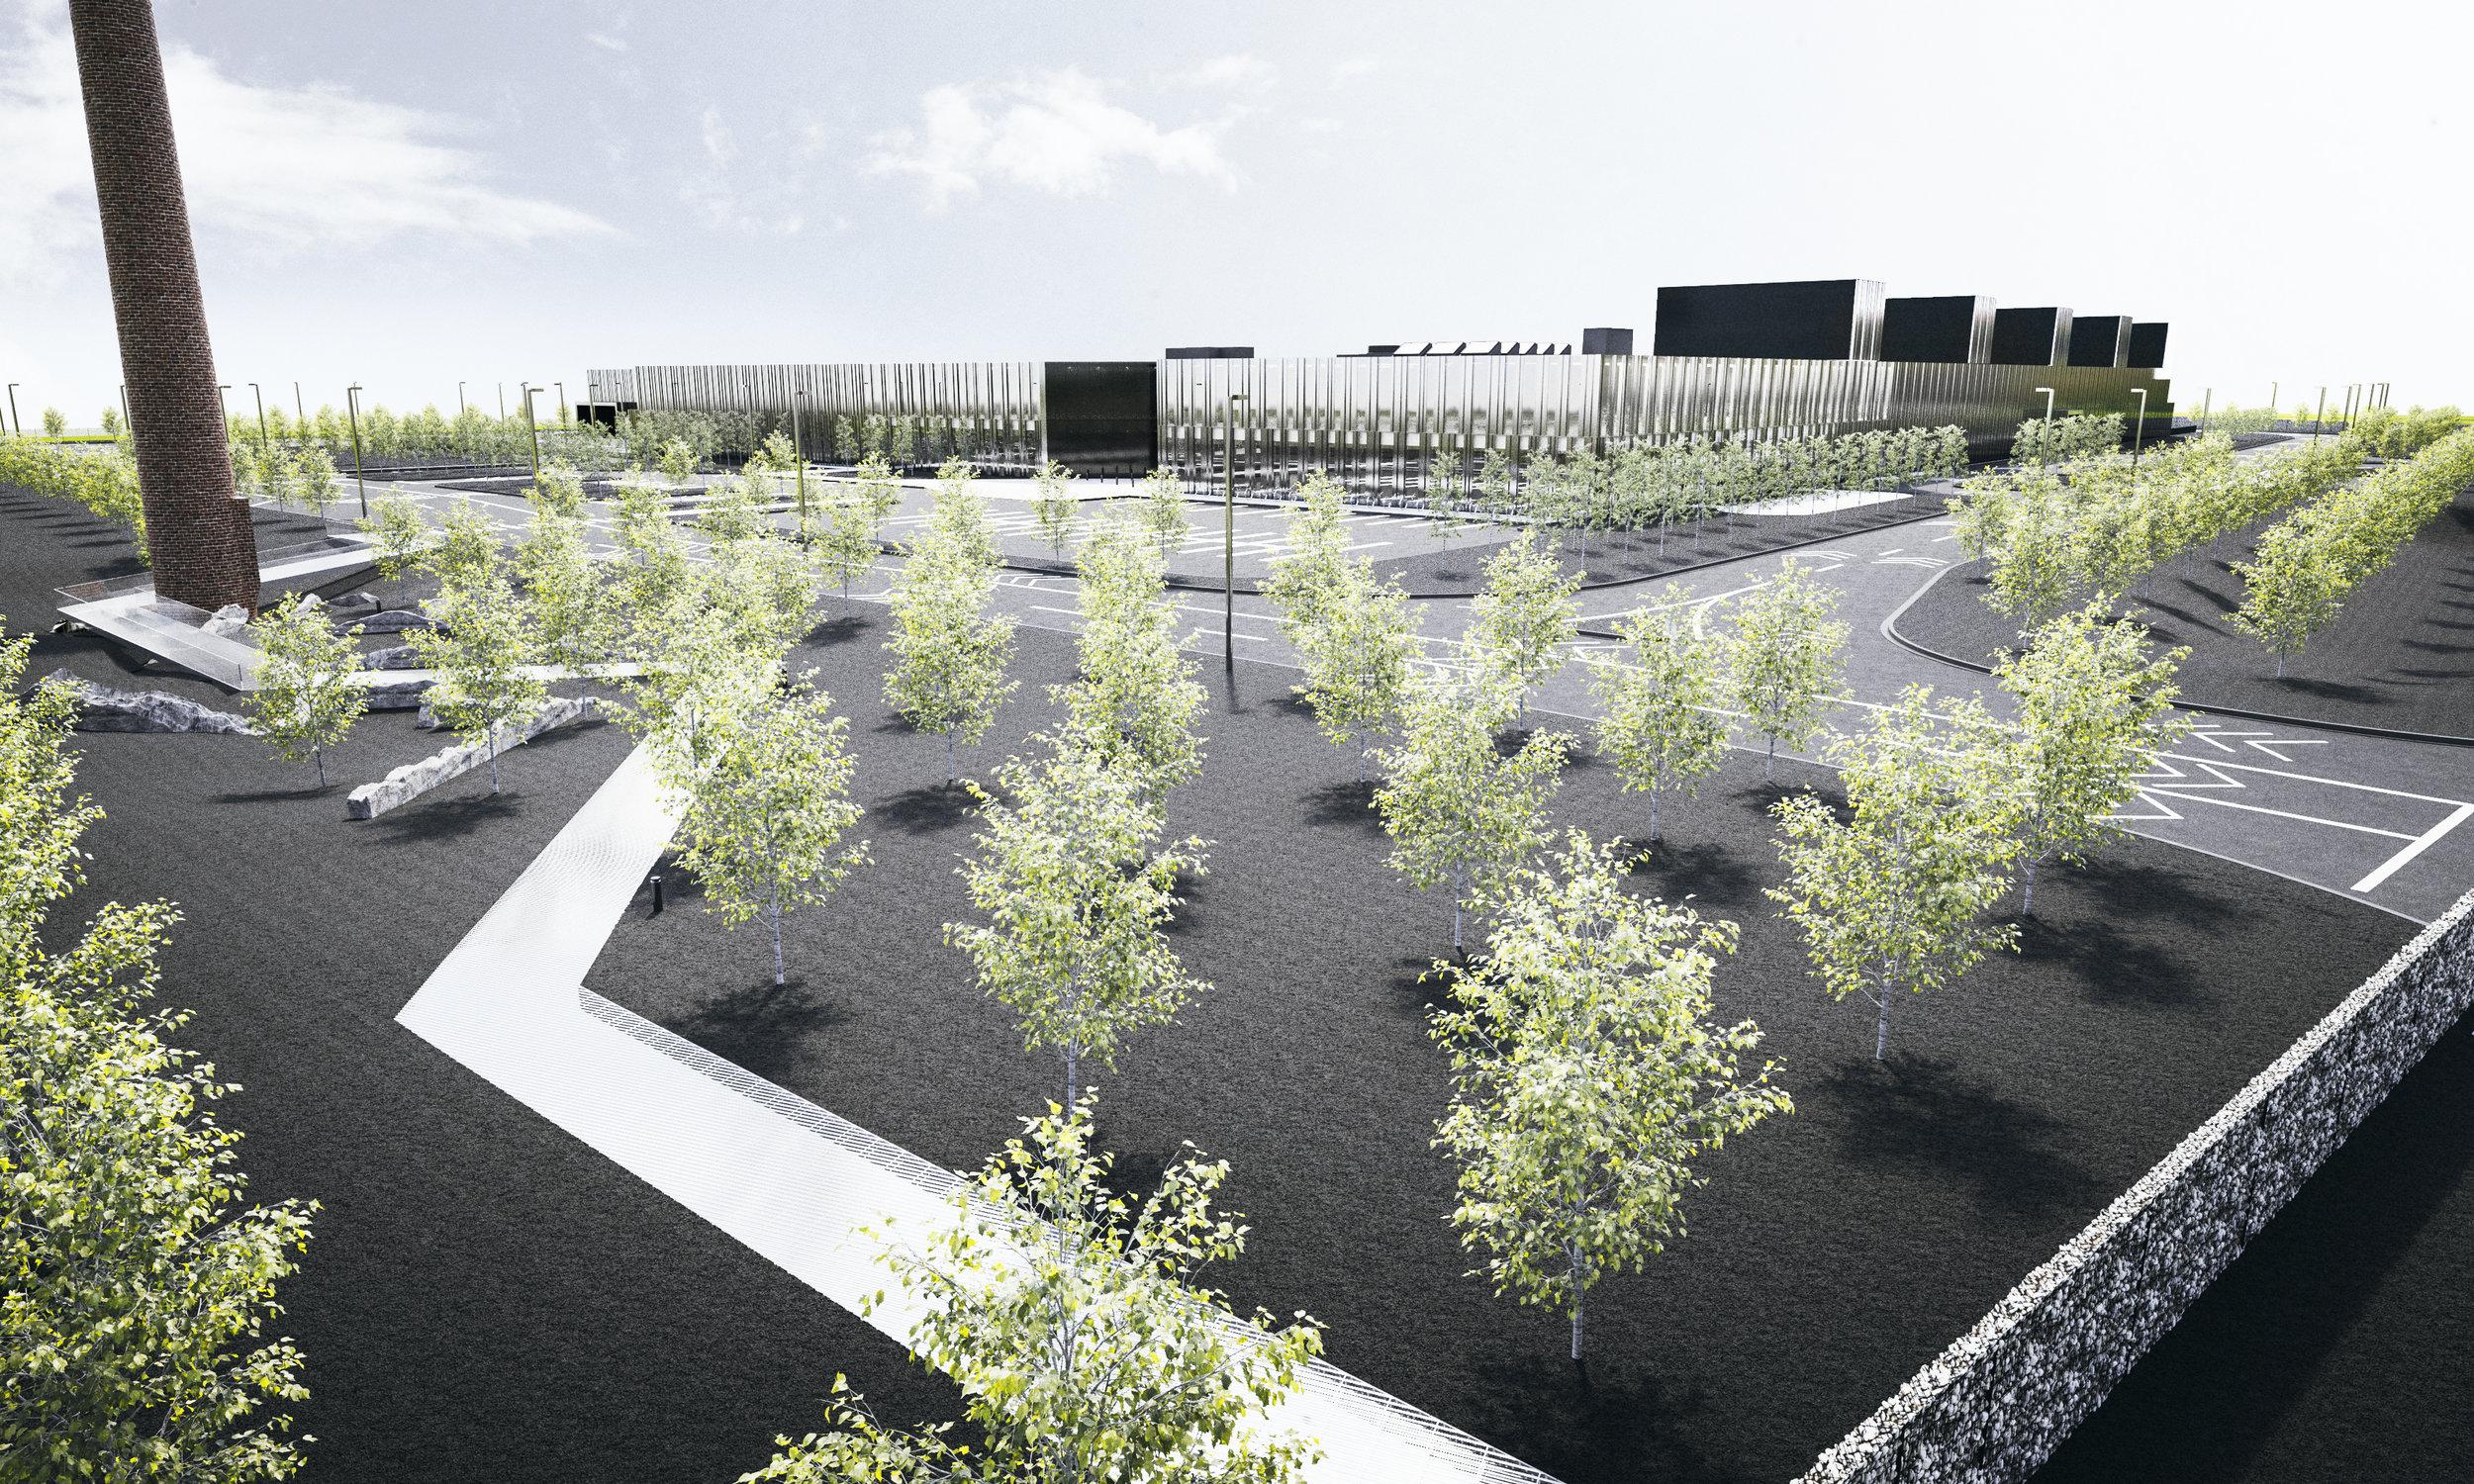 NETG - Aerial of Trees in Black Mulch Landscape